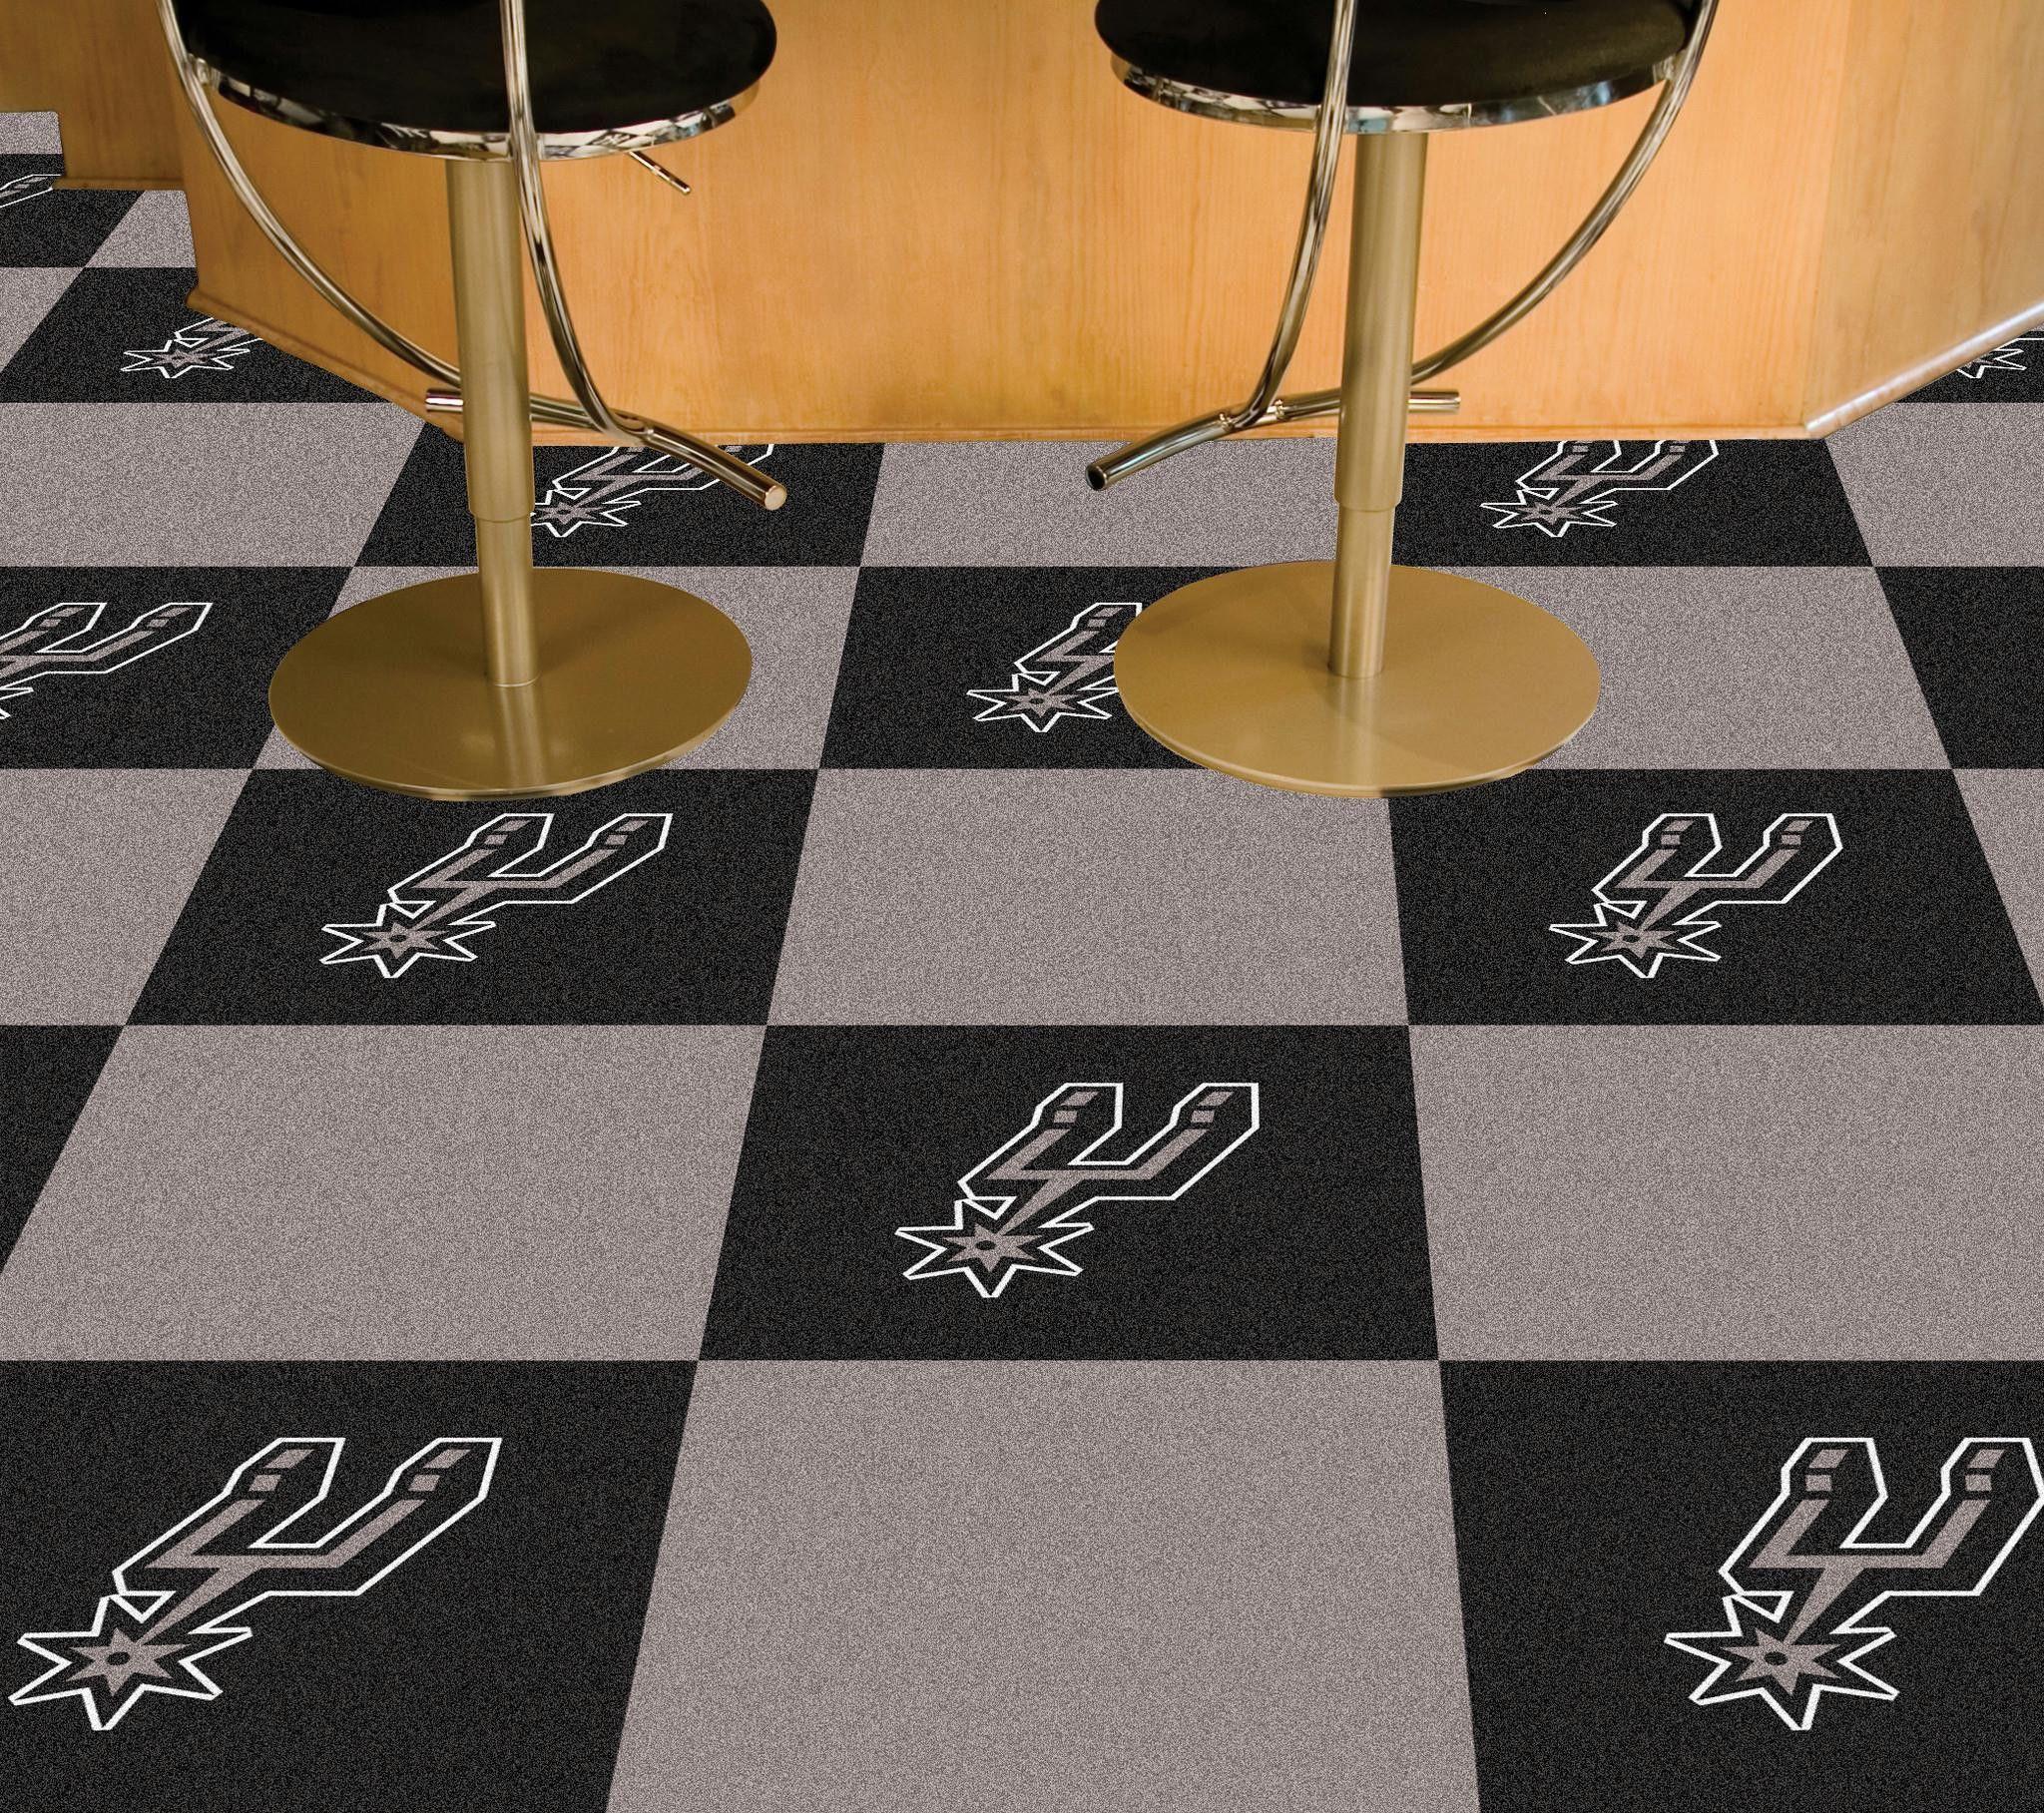 Nba san antonio spurs carpet tiles 18x18 tiles products nba san antonio spurs carpet tiles 18x18 tiles dailygadgetfo Choice Image